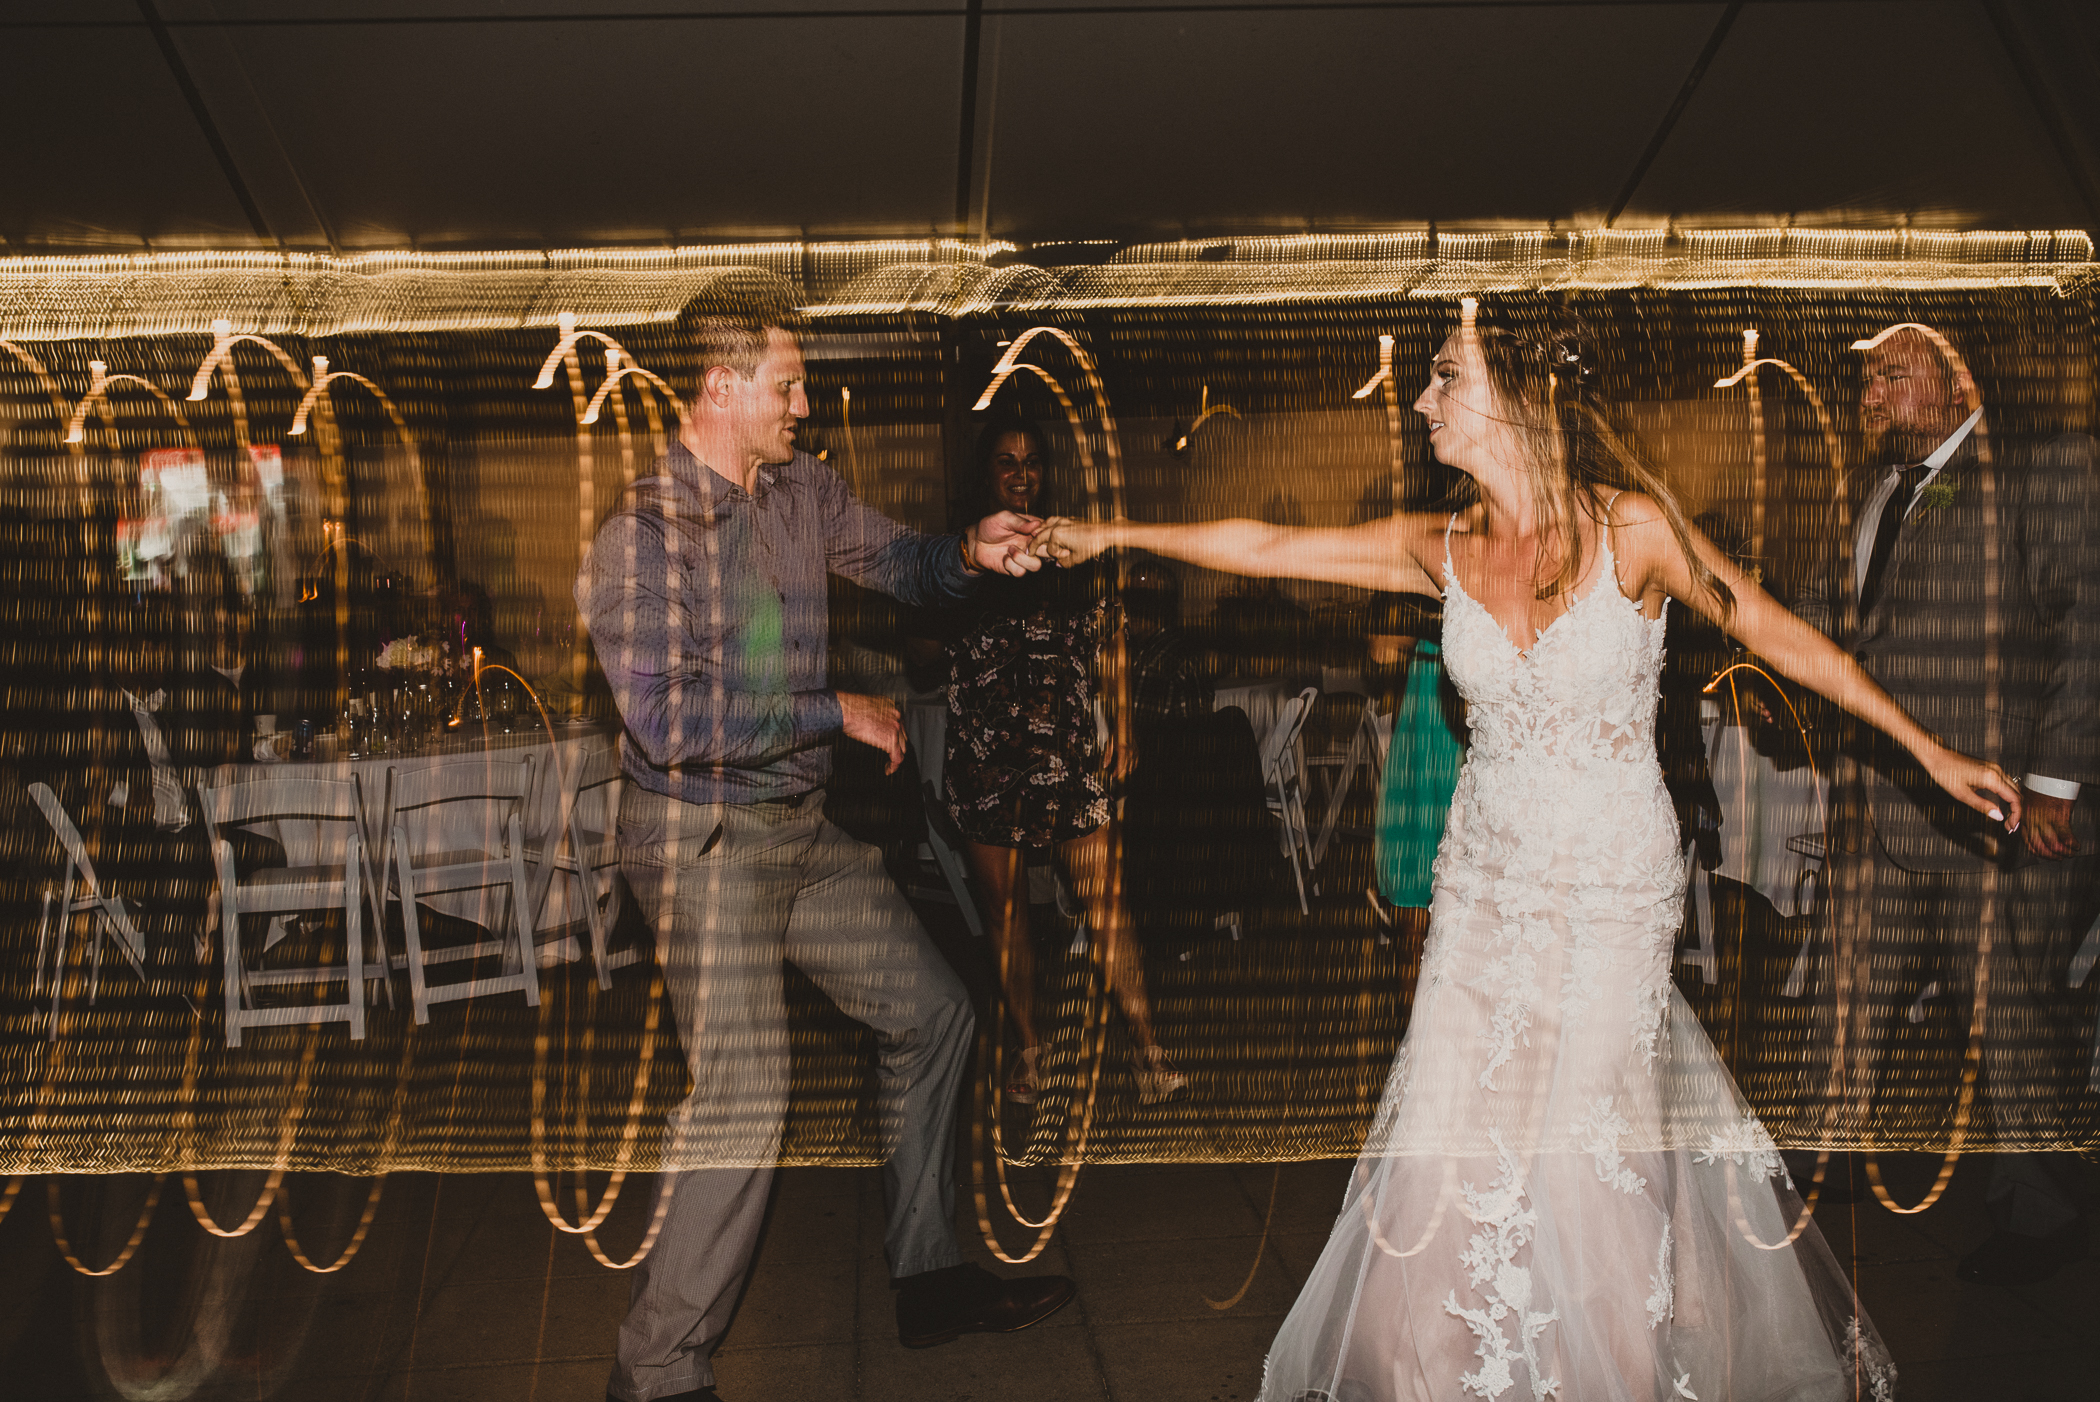 reception dance floor bride